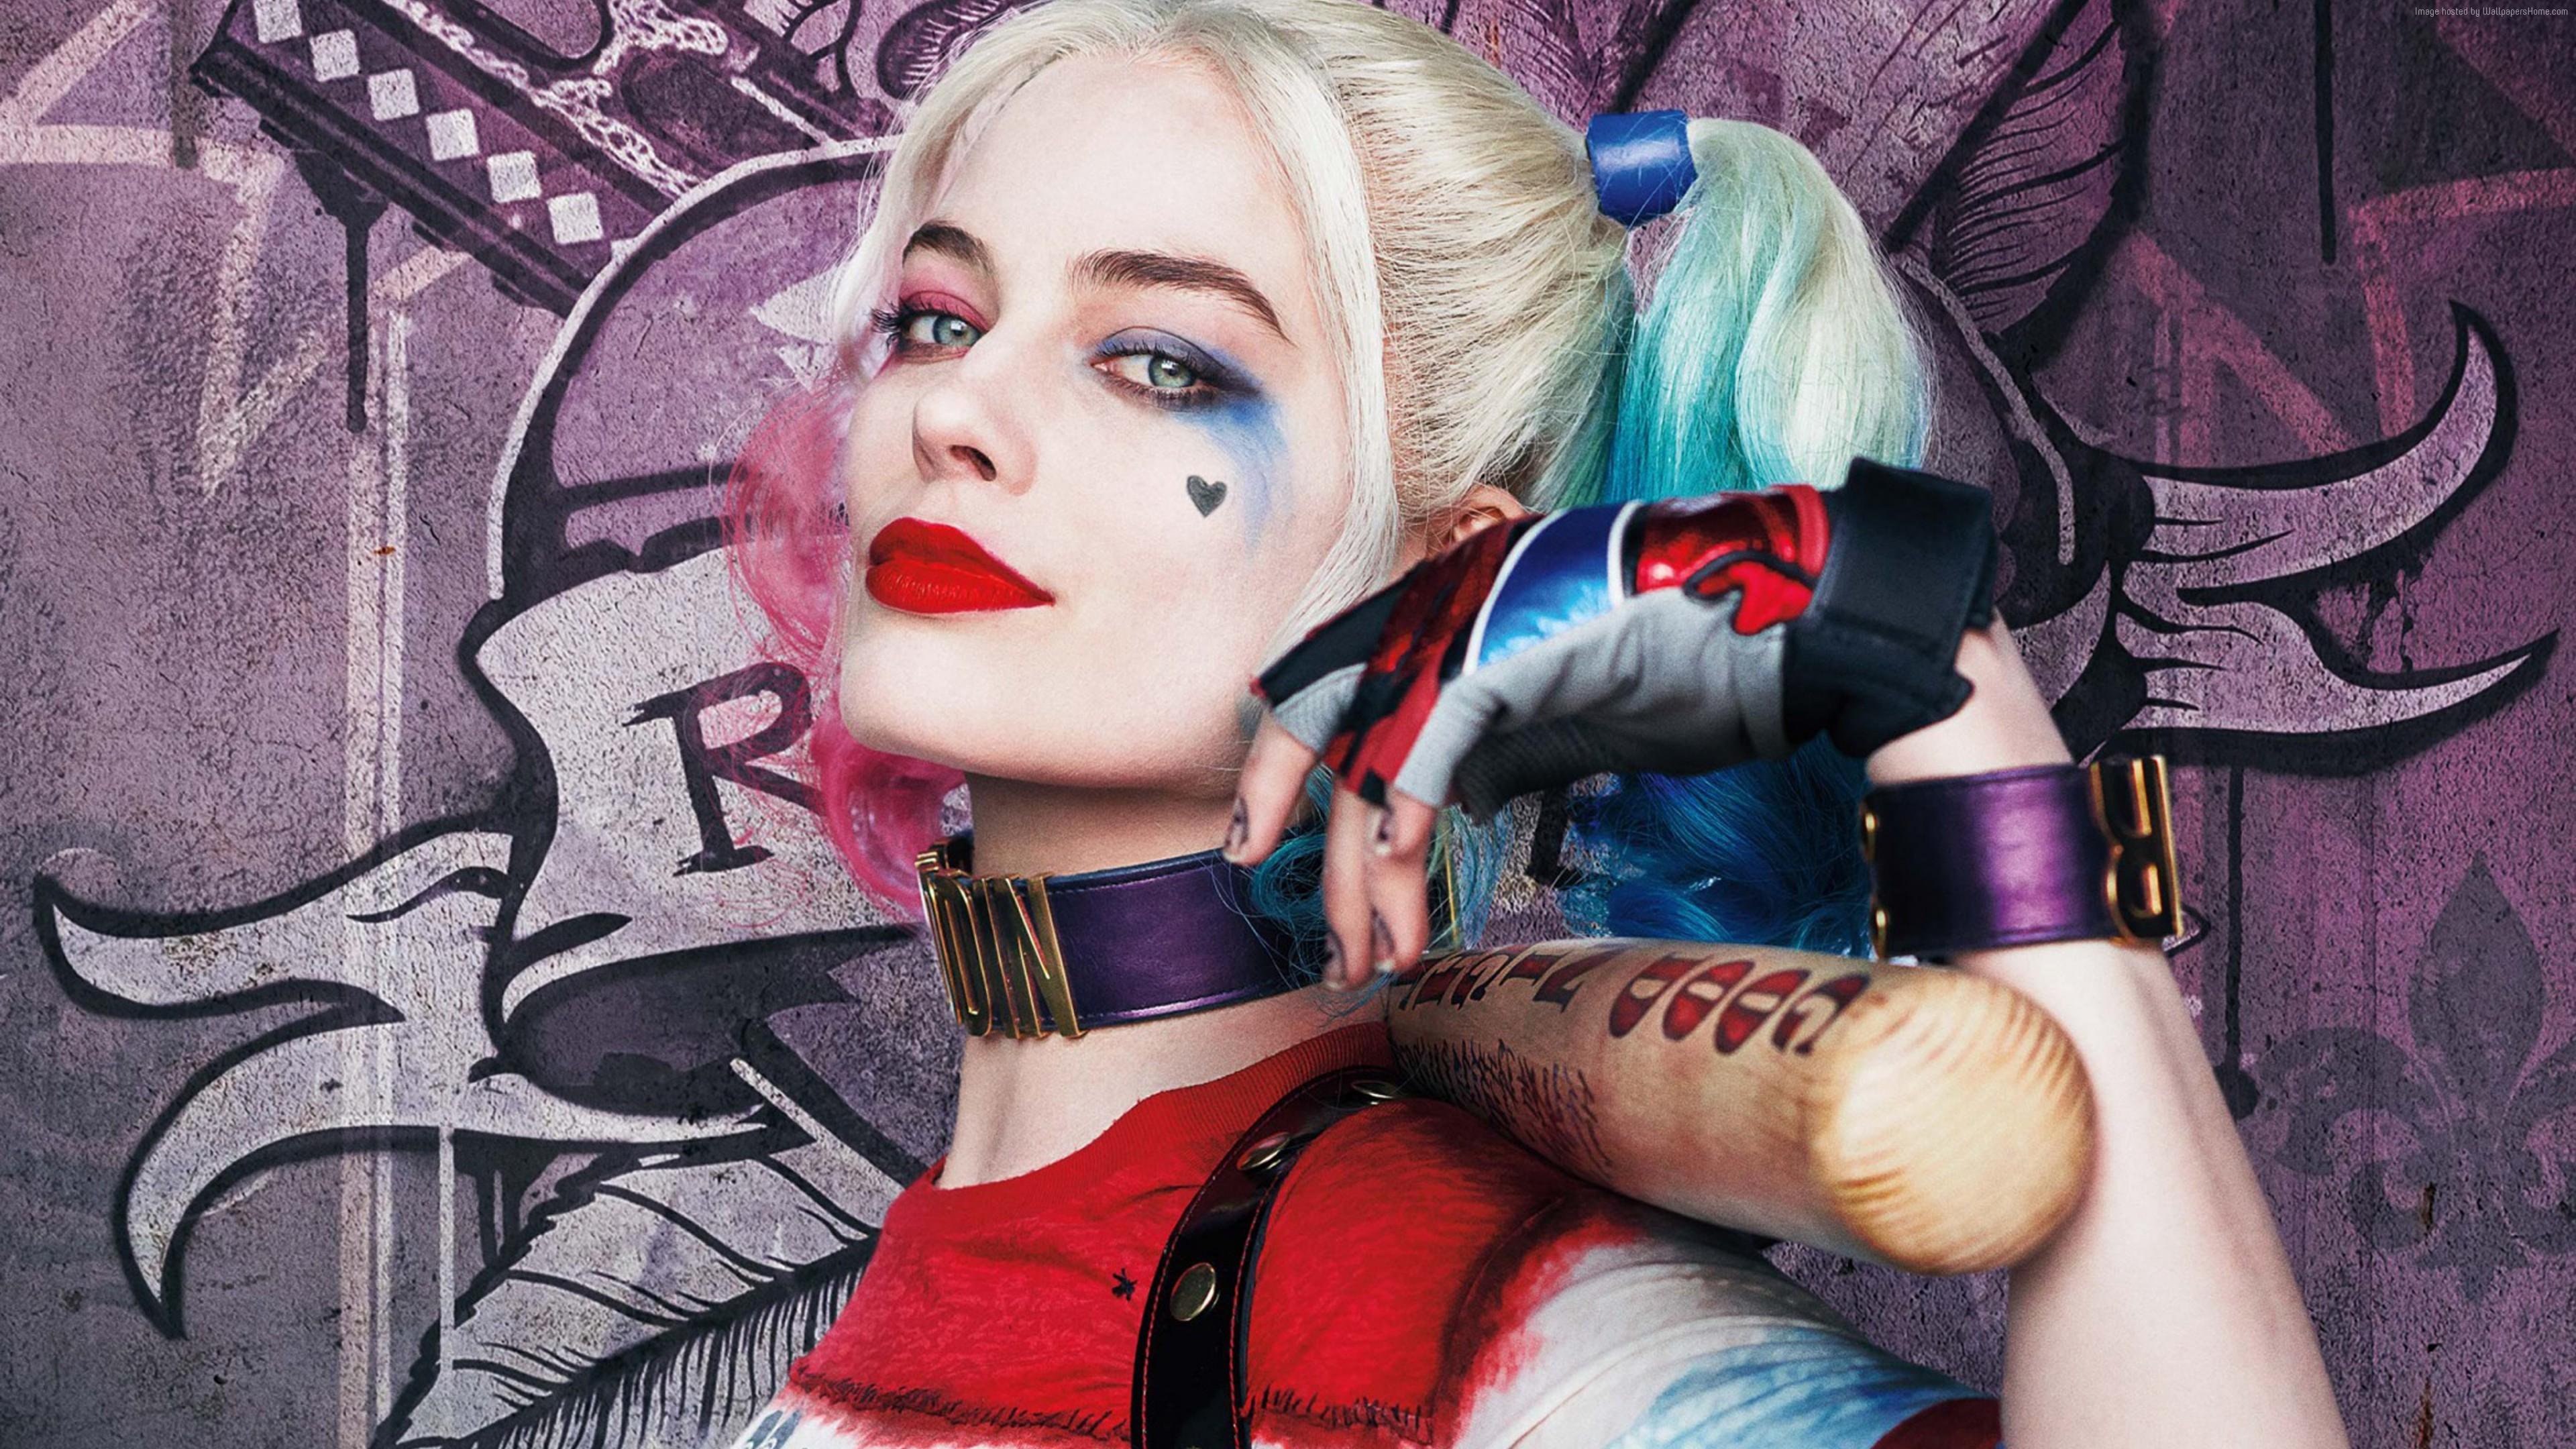 Wonderful Wallpaper Movie Harley Quinn - harley-quinn-suicide-squad-2-ap  Graphic_67958.jpg